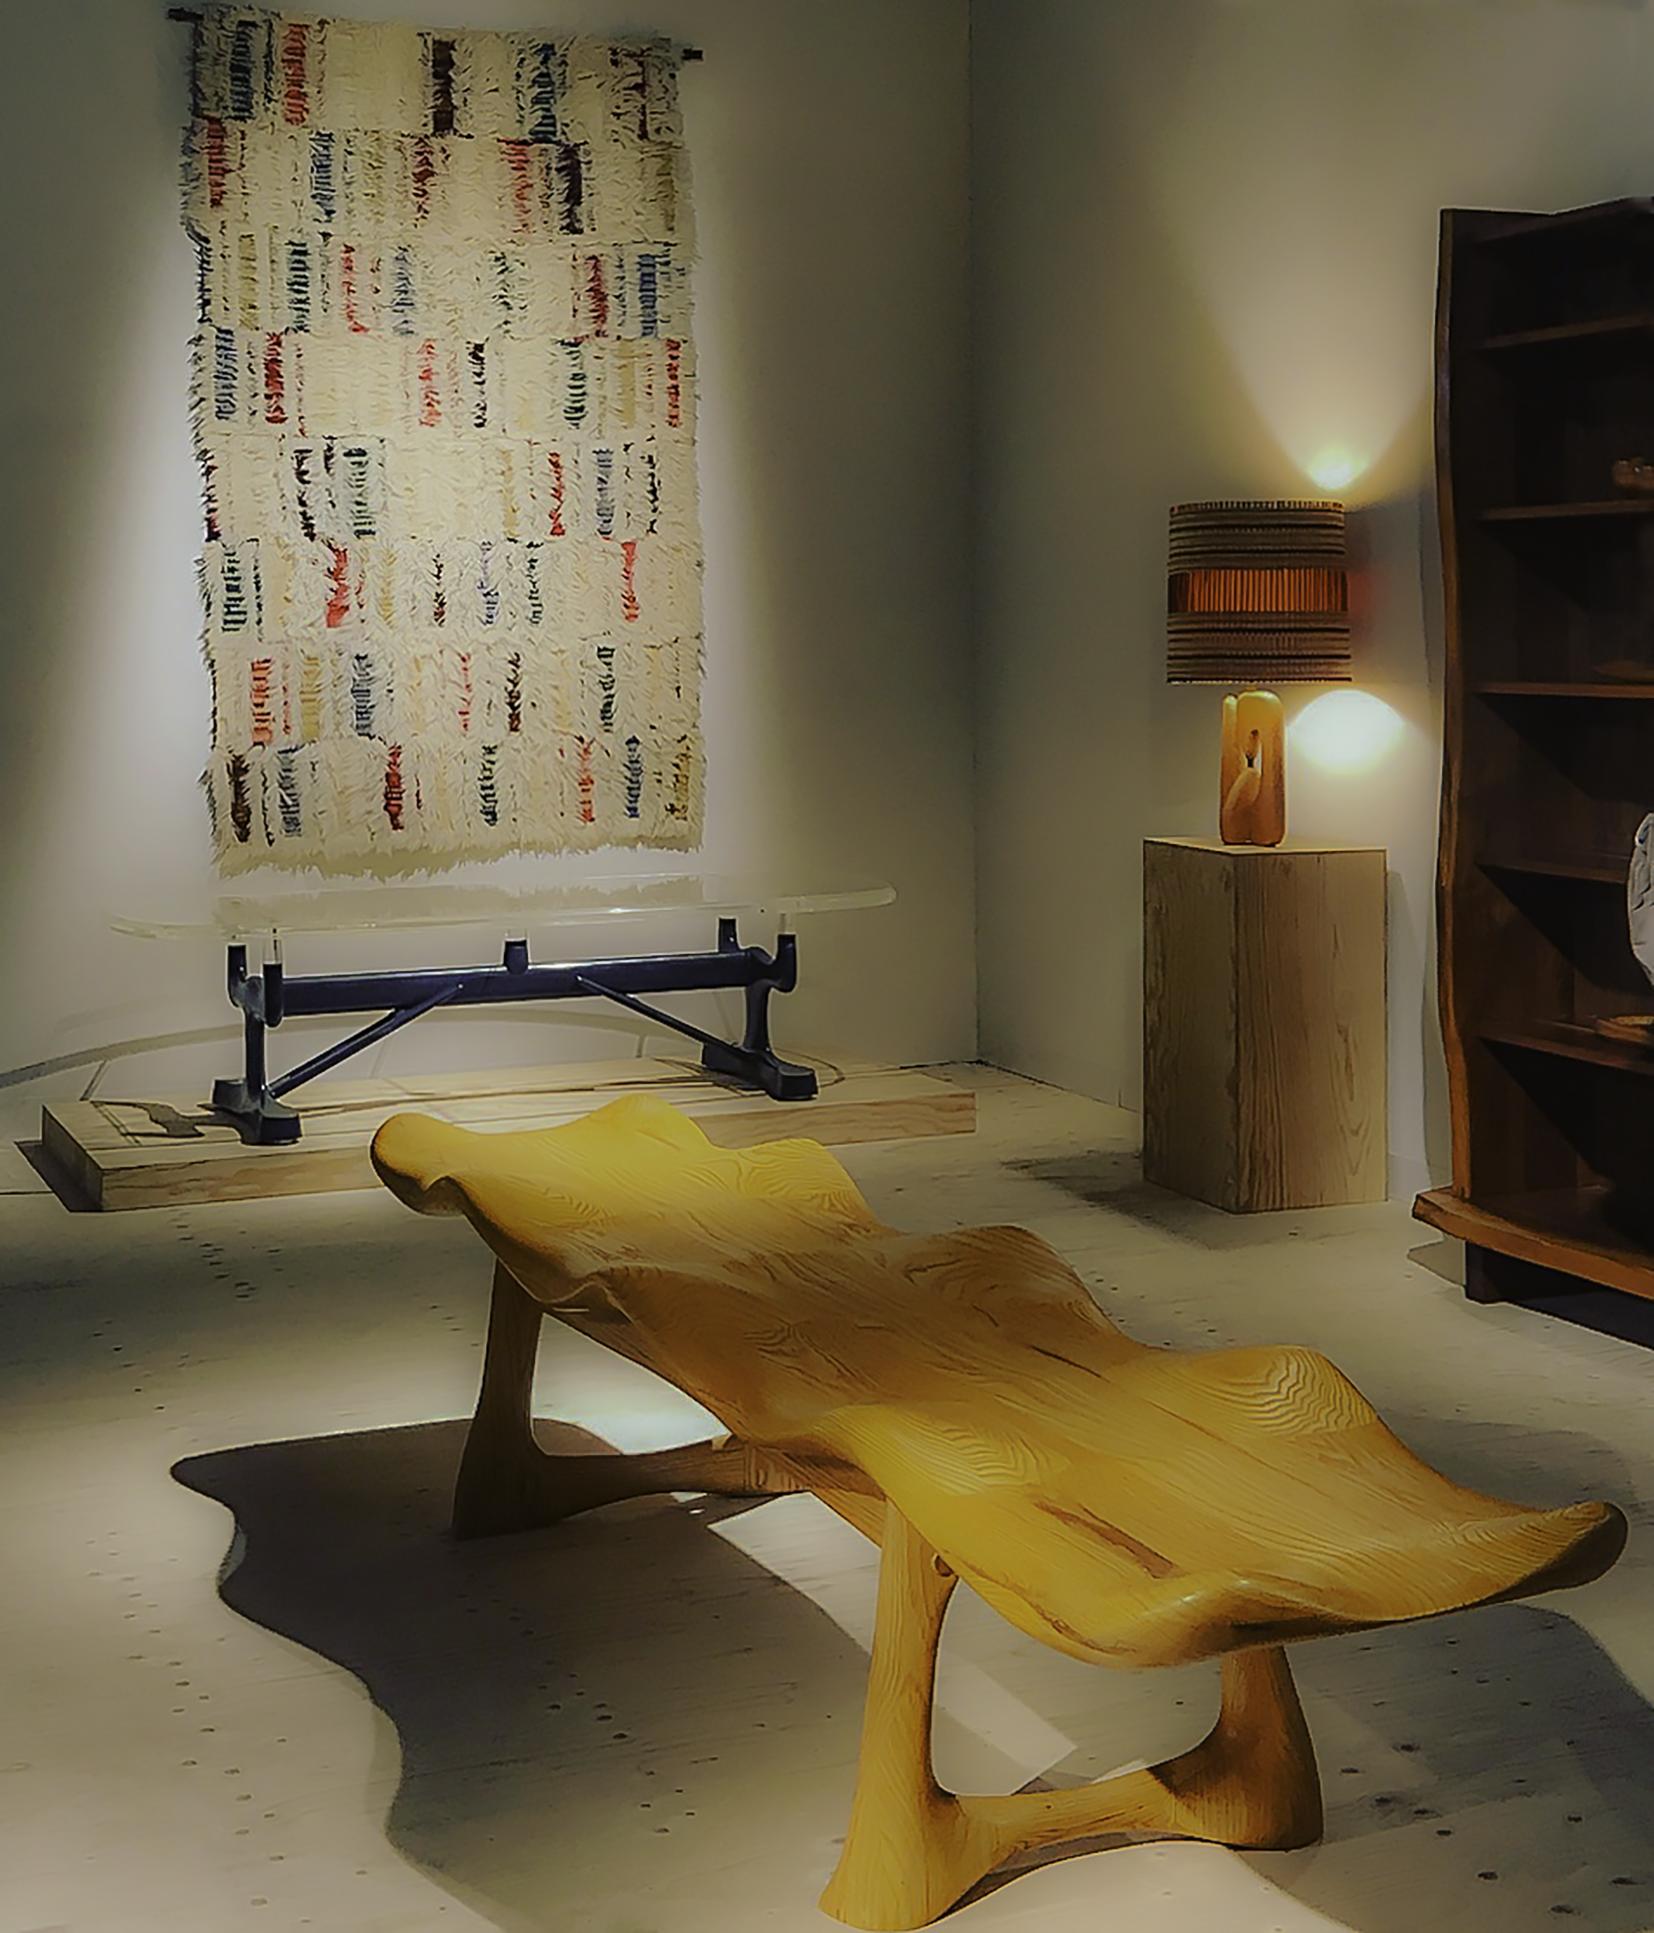 Galerie Eric Philippe - DesignMiami/ Art Basel; on display Peter Danko oak bench, USA 1973 (center) Ingrid Hellman-Knafve rug, Sweden, circa 1950, Paul Laszlo lucite dark gray-blue lacquered wood and steel bench, USA 1958 (background)